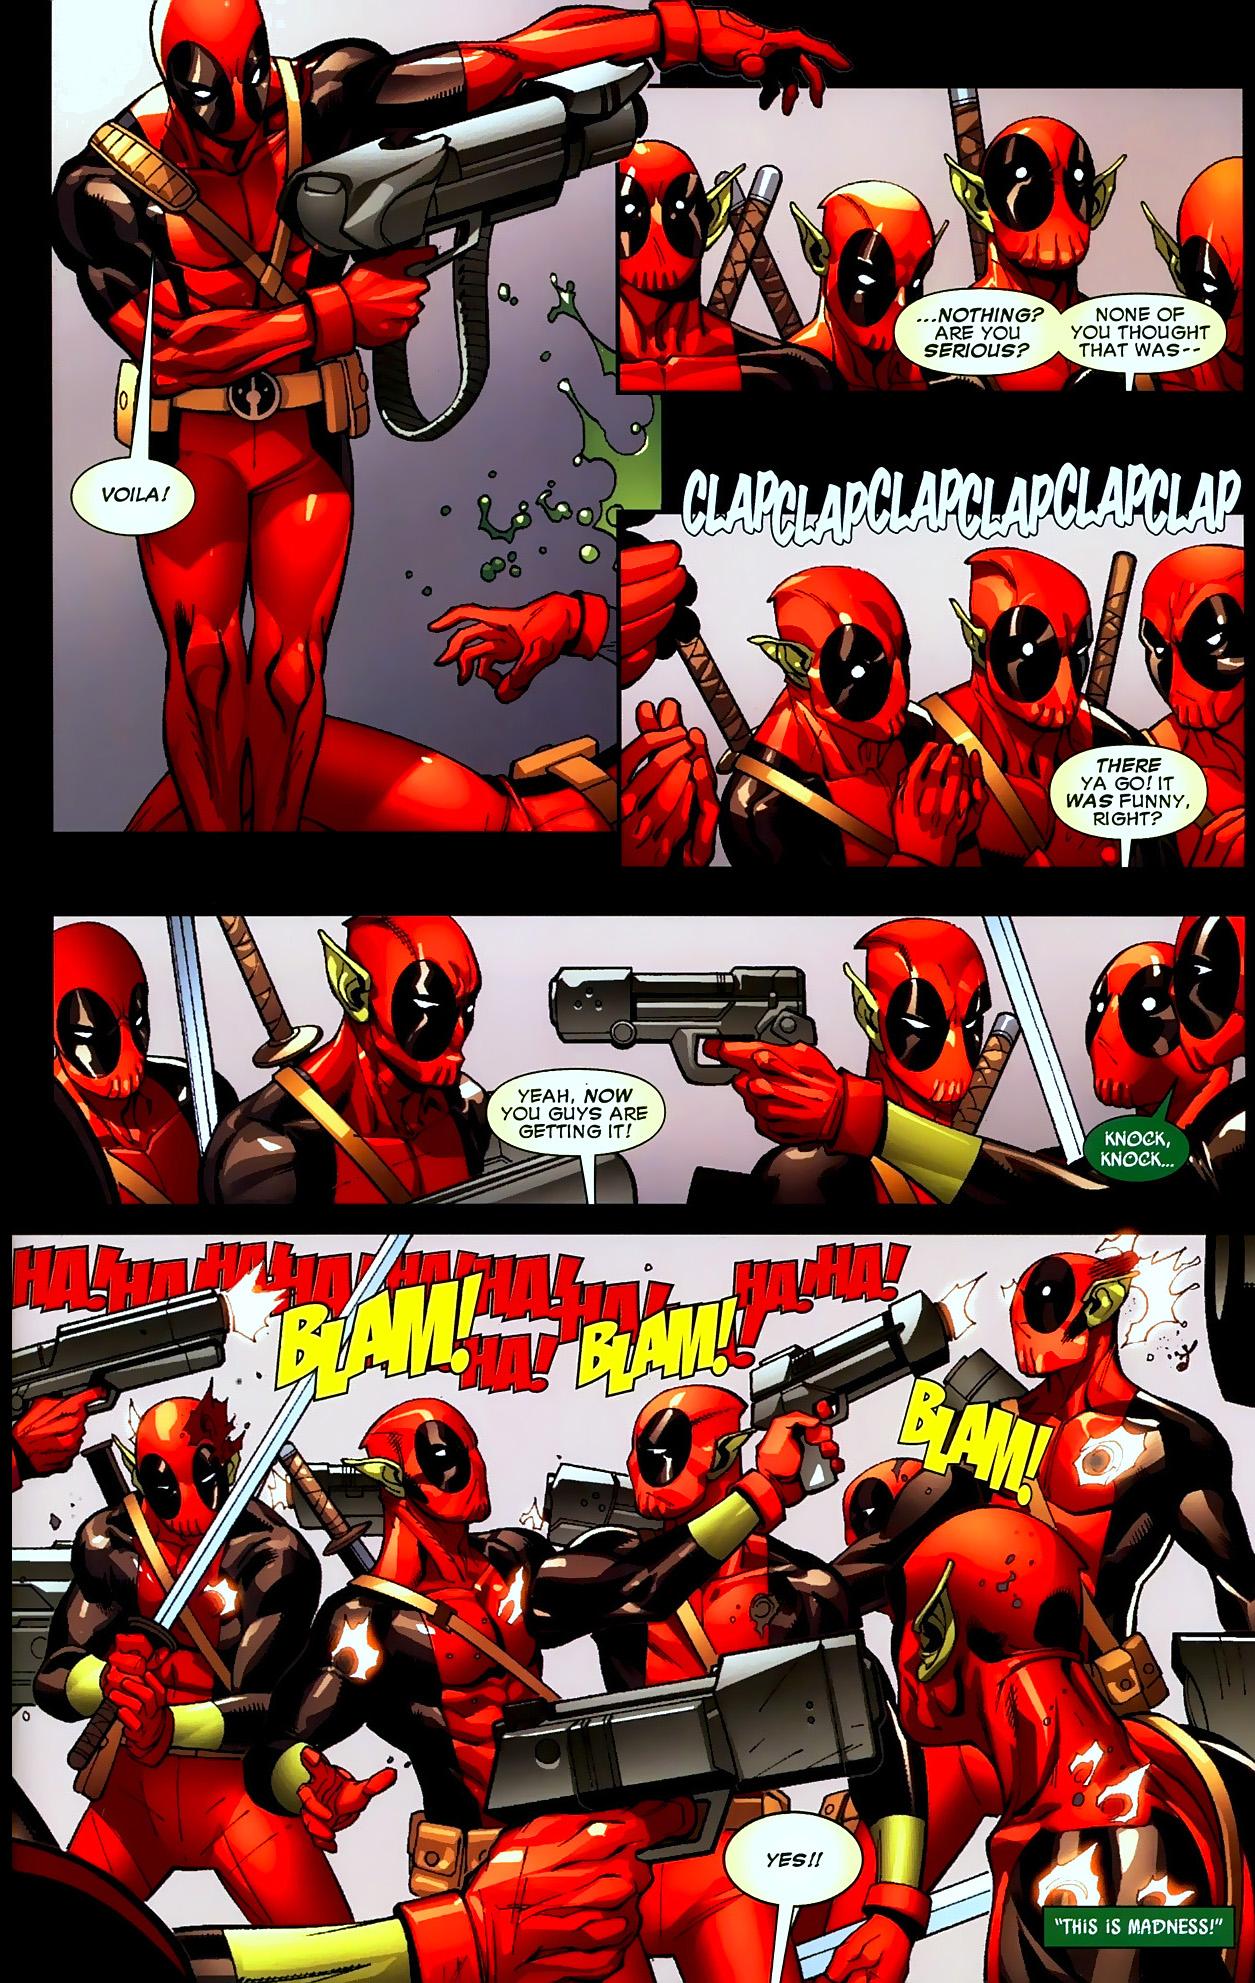 Yoda Wallpaper Quotes Deadpool Trains His Deadpool Type Super Skrulls Comicnewbies